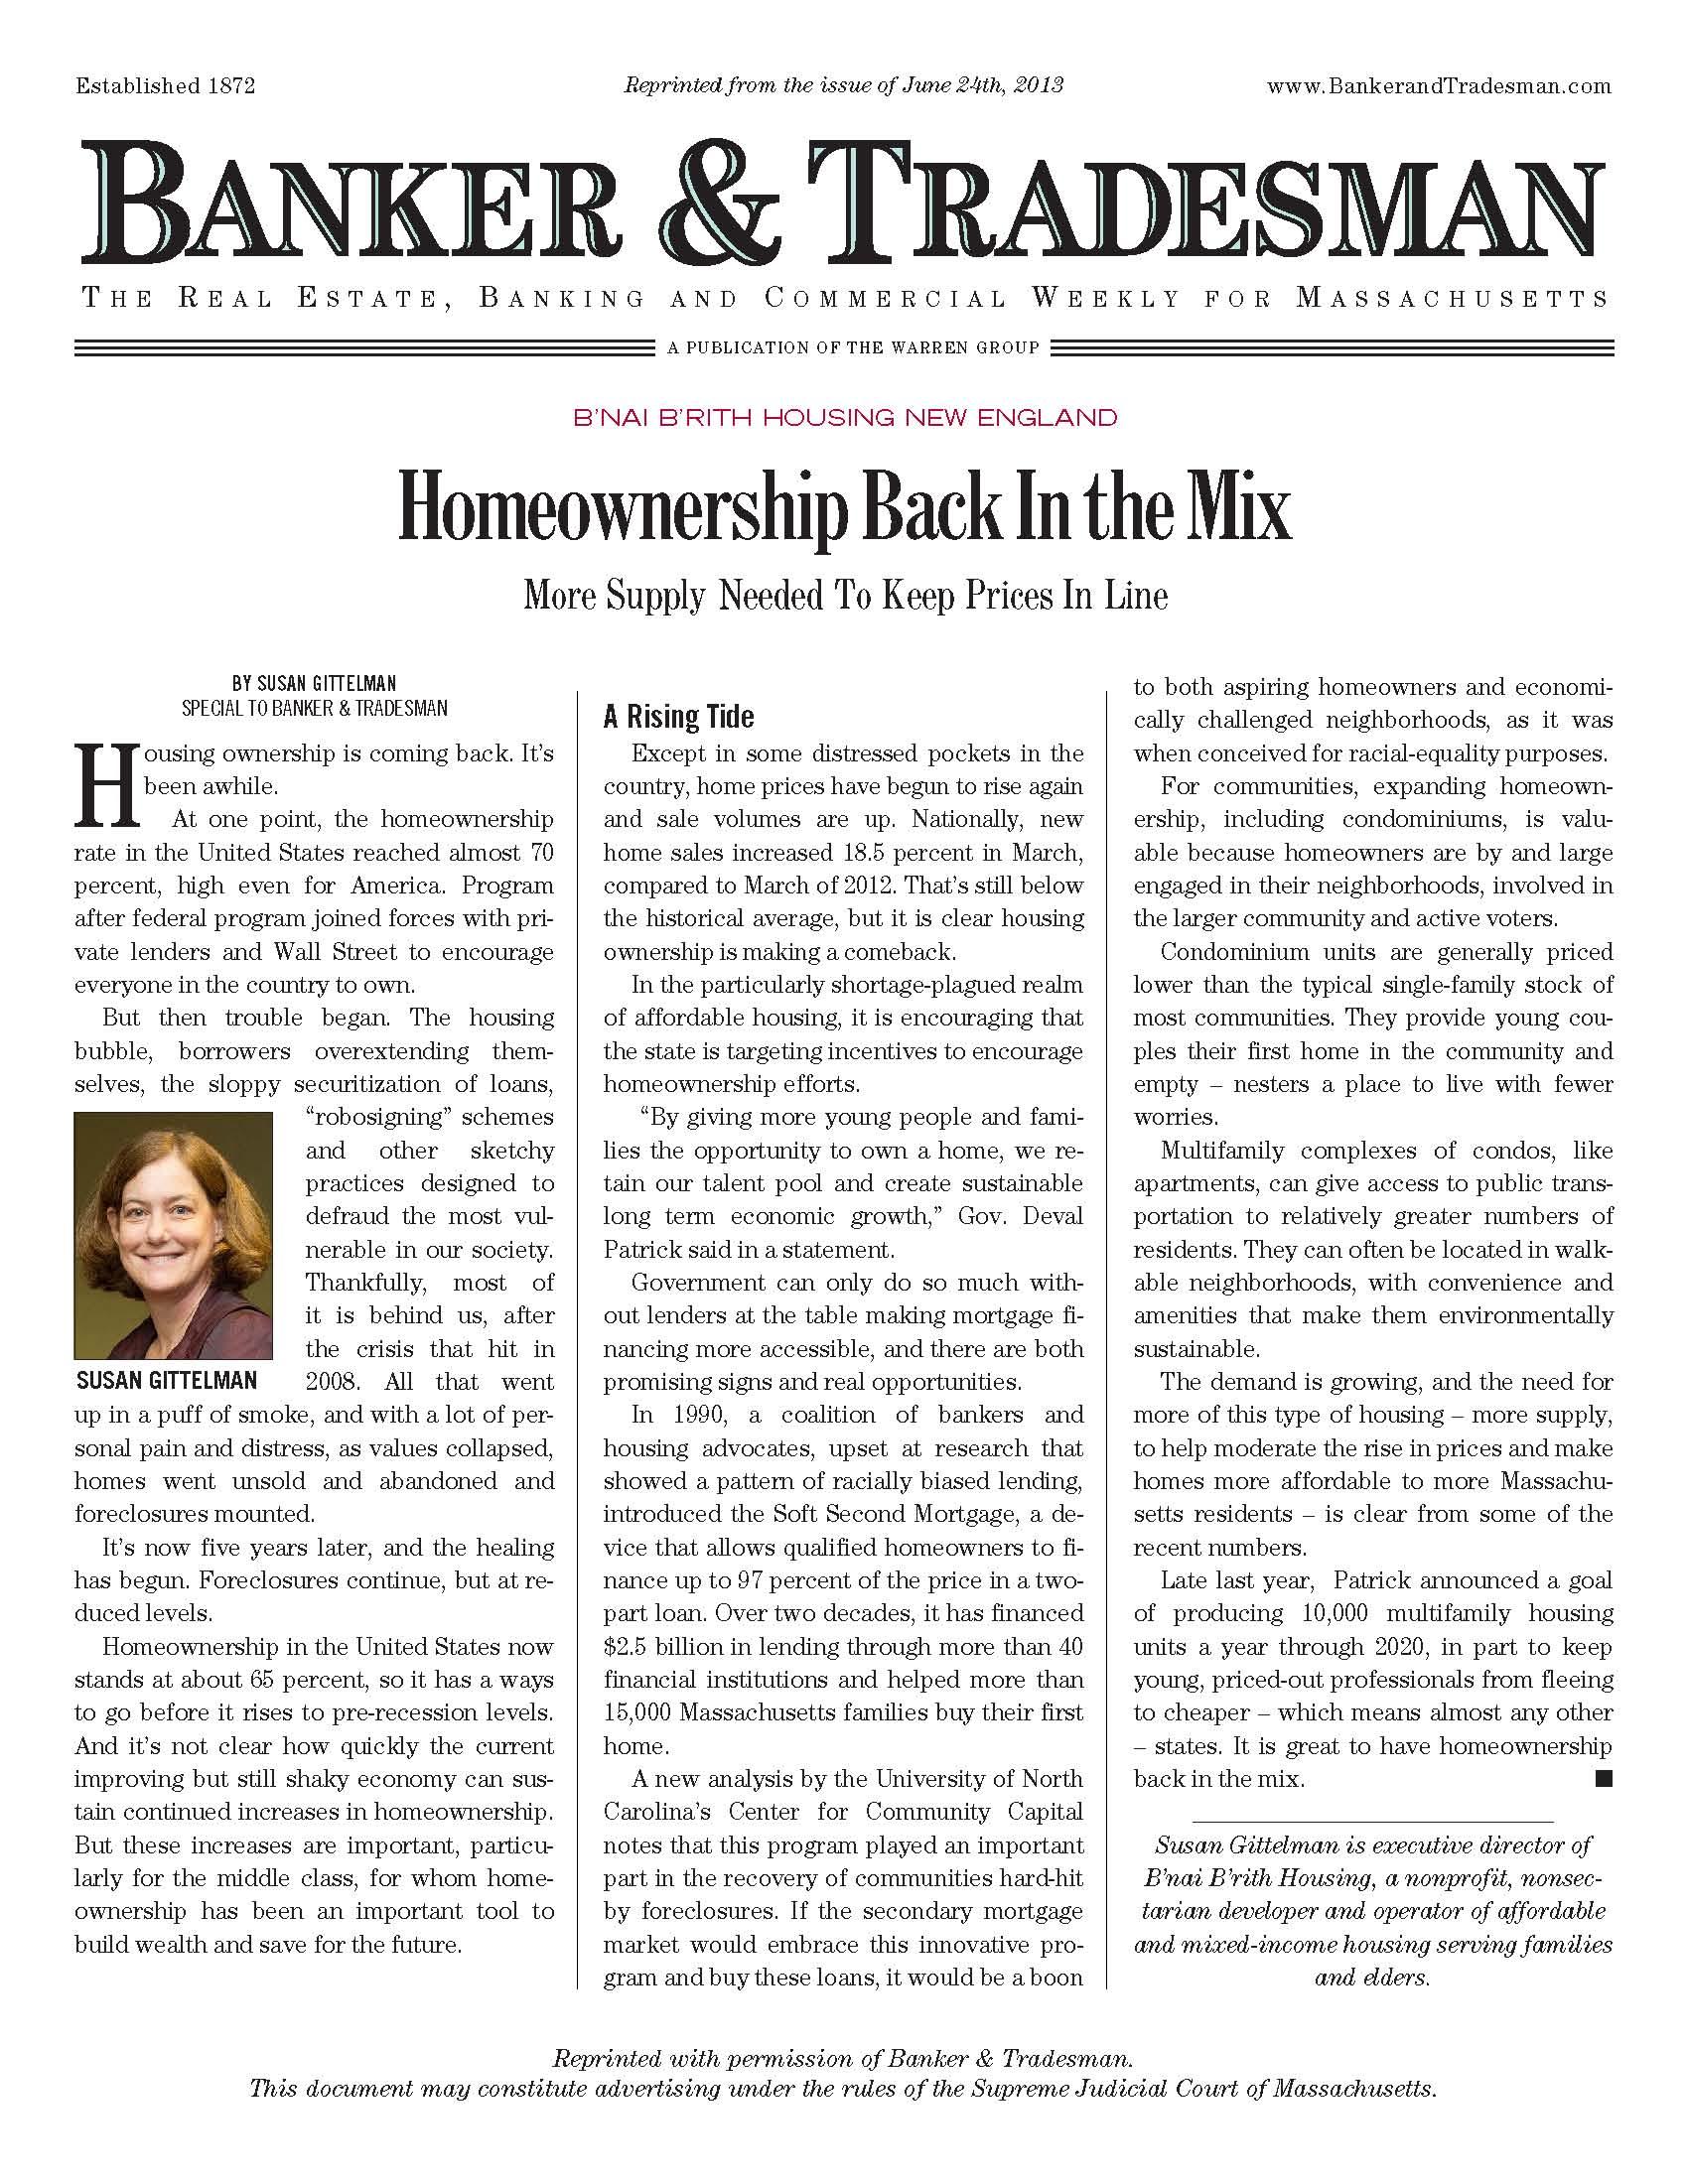 Image of Banker & Tradesman column by B'nai B'rith Housing Executive Director Susan Gittleman: Homeownership Back In the Mix